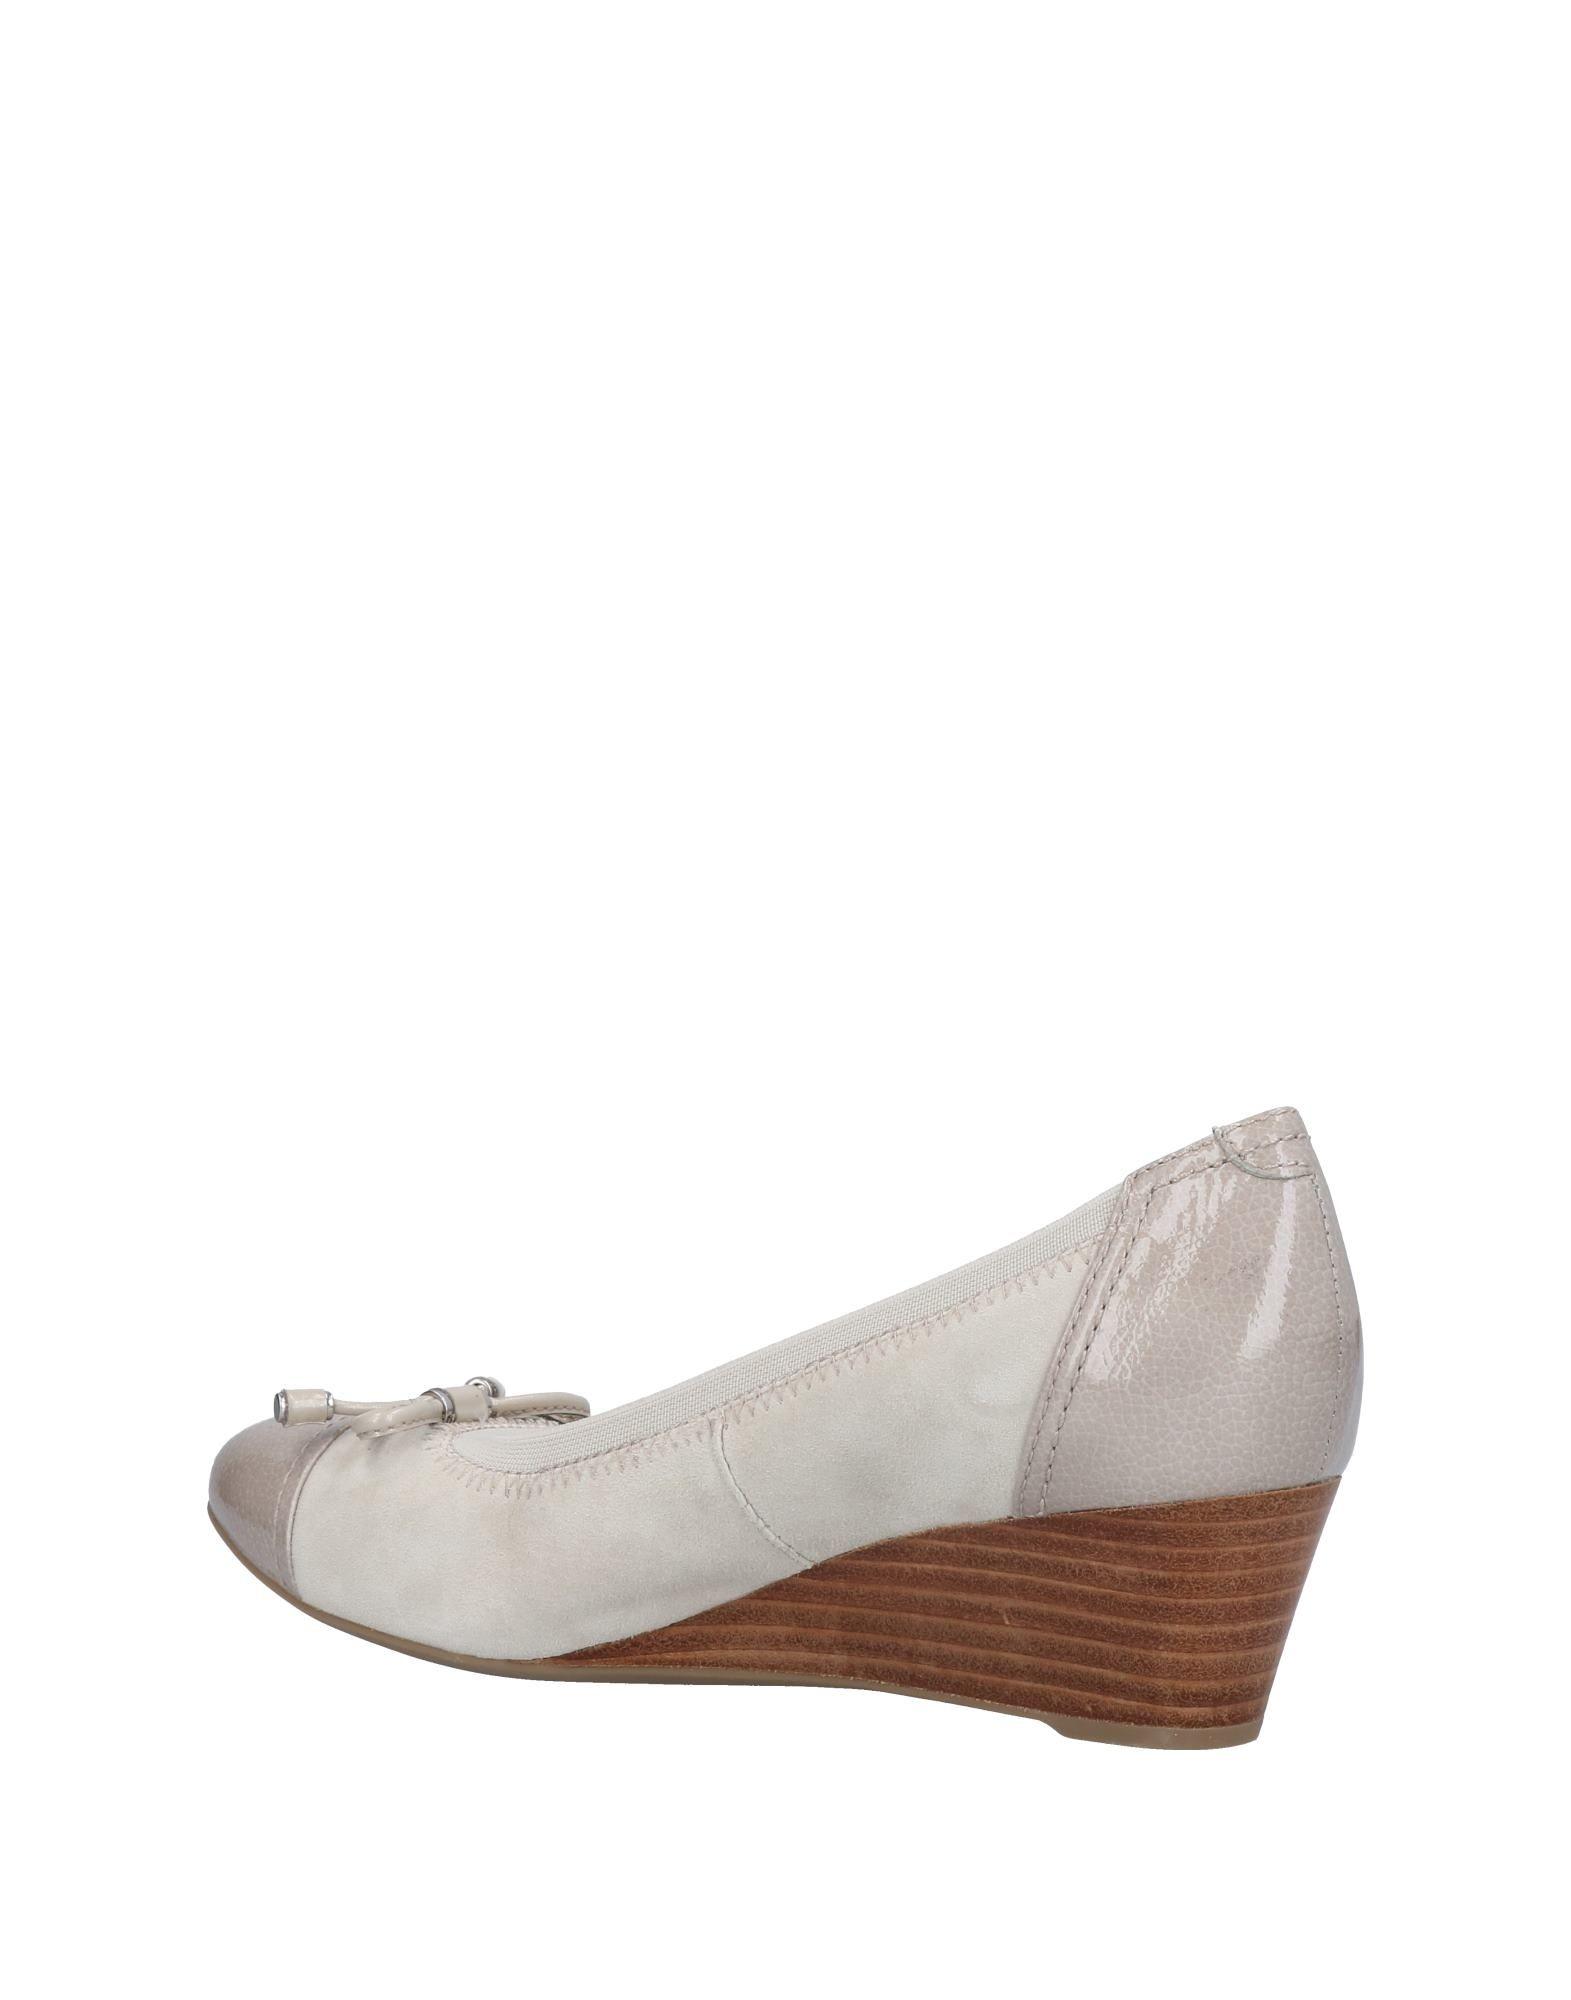 Damen Geox Pumps Damen   11414163SW Heiße Schuhe 24593f